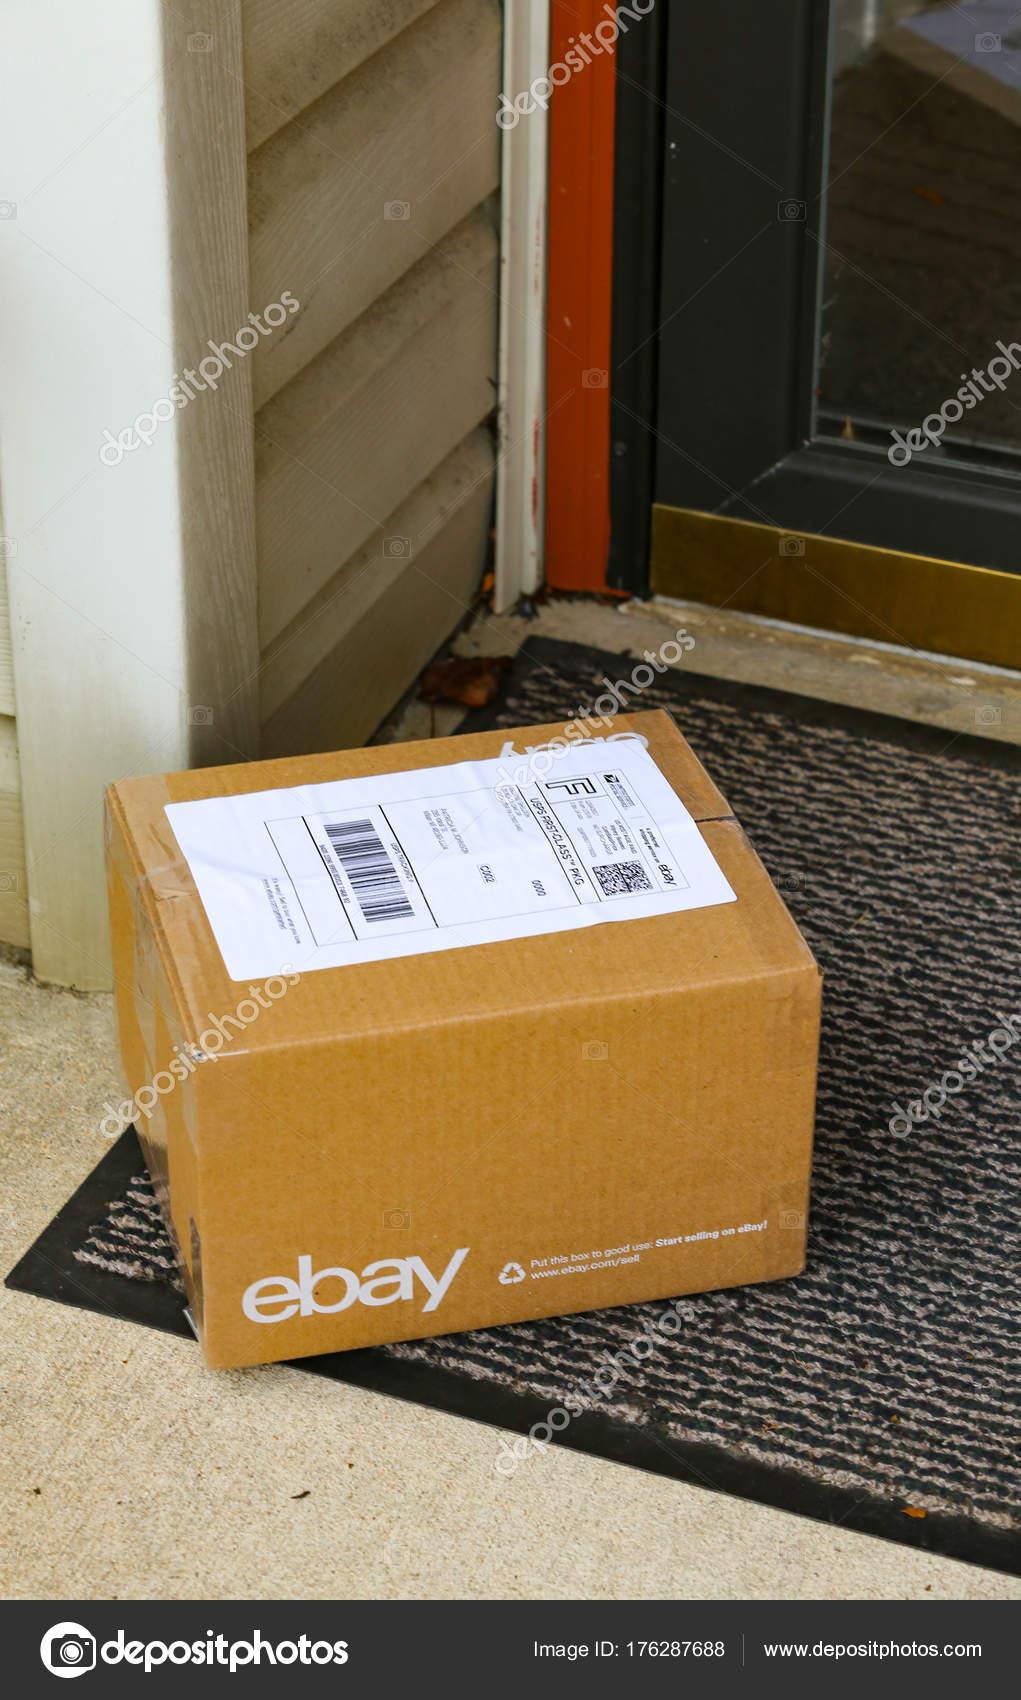 Braun Ebay Paket An Haustur Redaktionelles Stockfoto